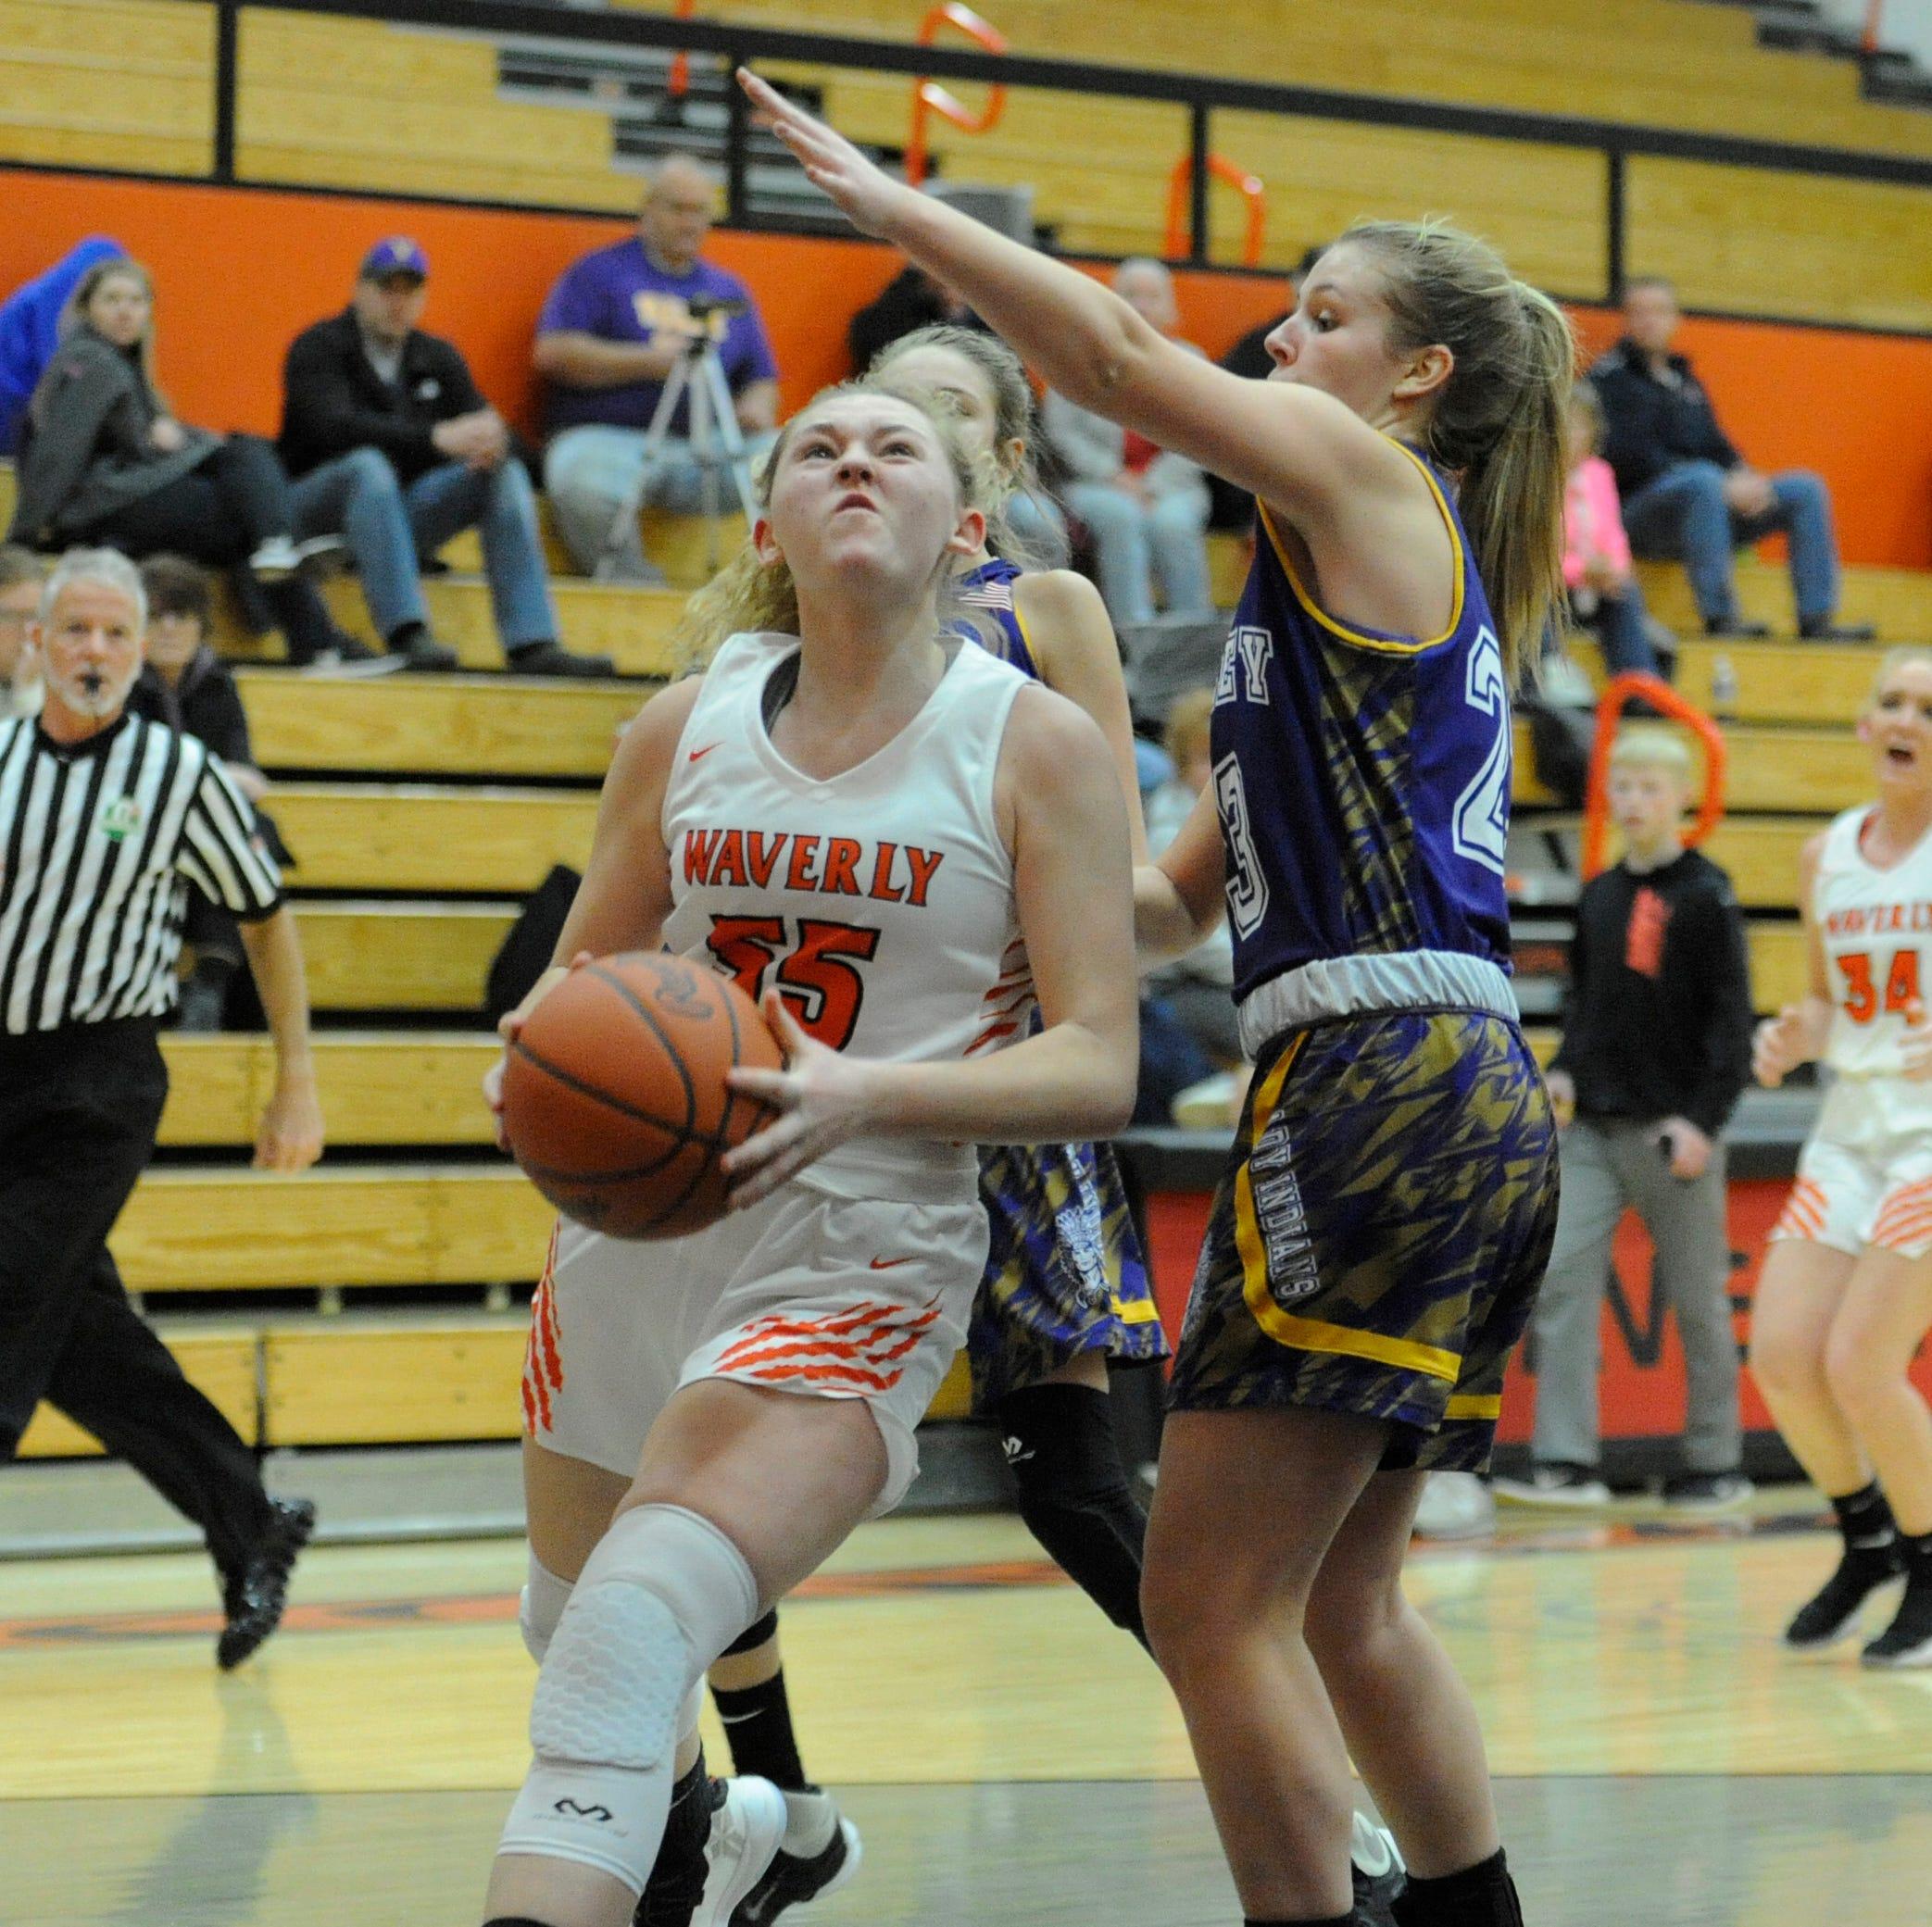 DAILY DIGEST: Waverly girls basketball falls to Wheelersburg despite Carter's 21 boards